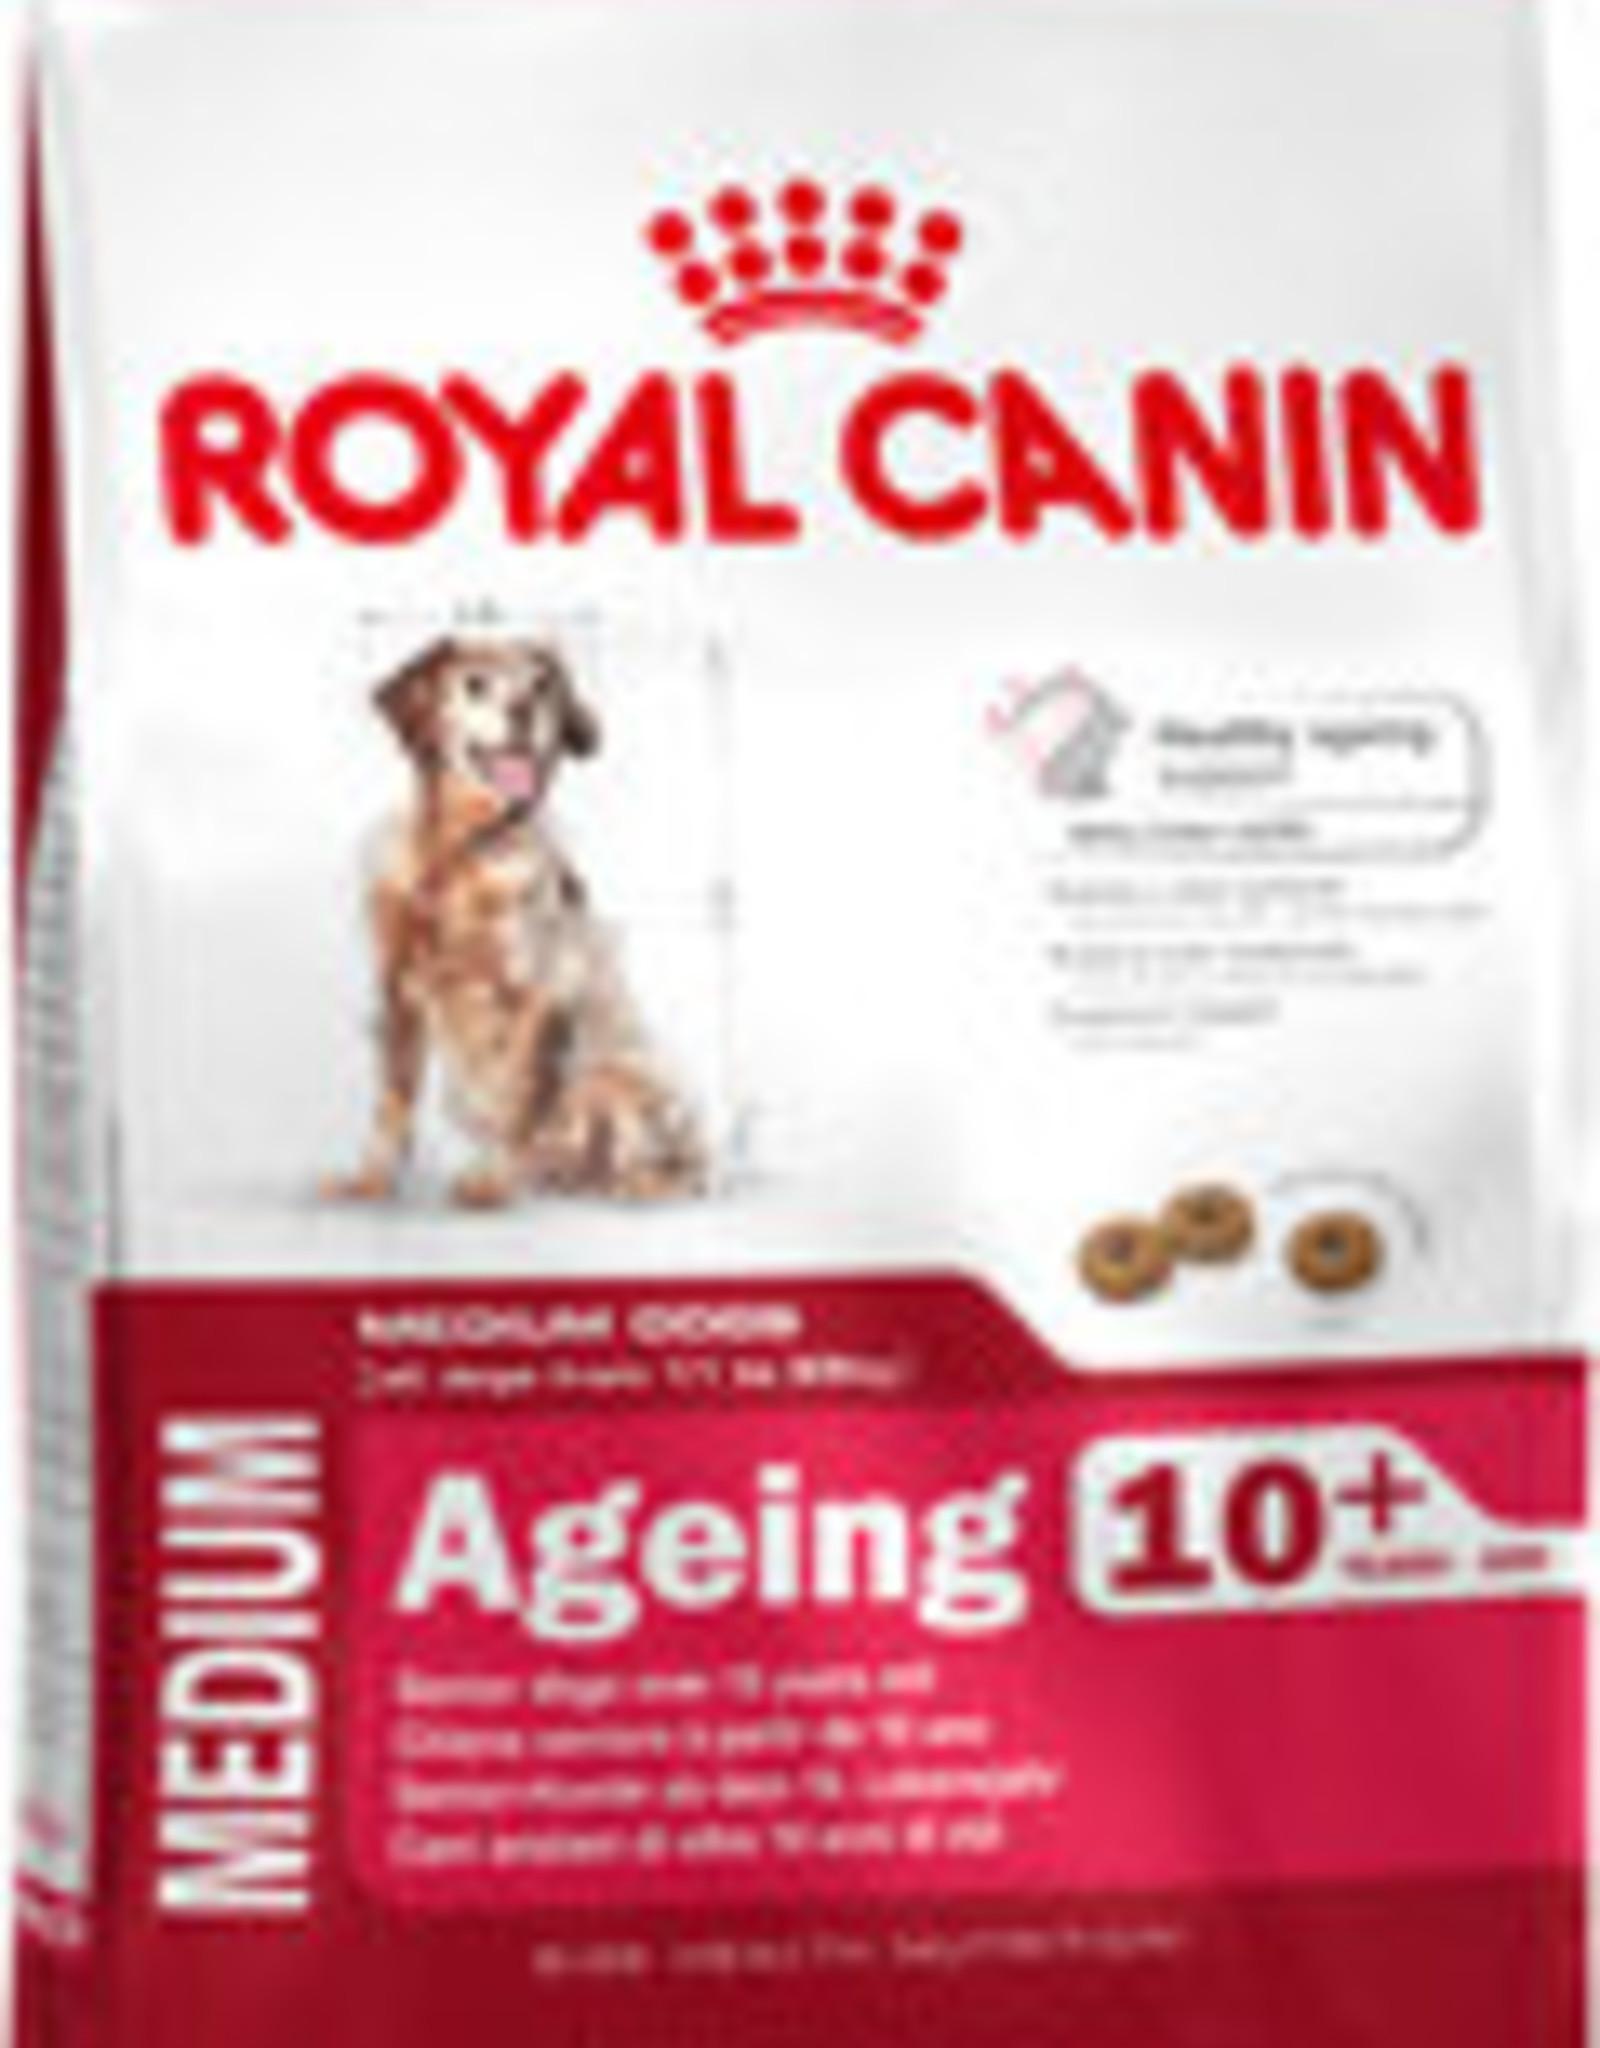 Royal Canin Royal Canin Bhn Medium Ageing 10+ Hond 15kg